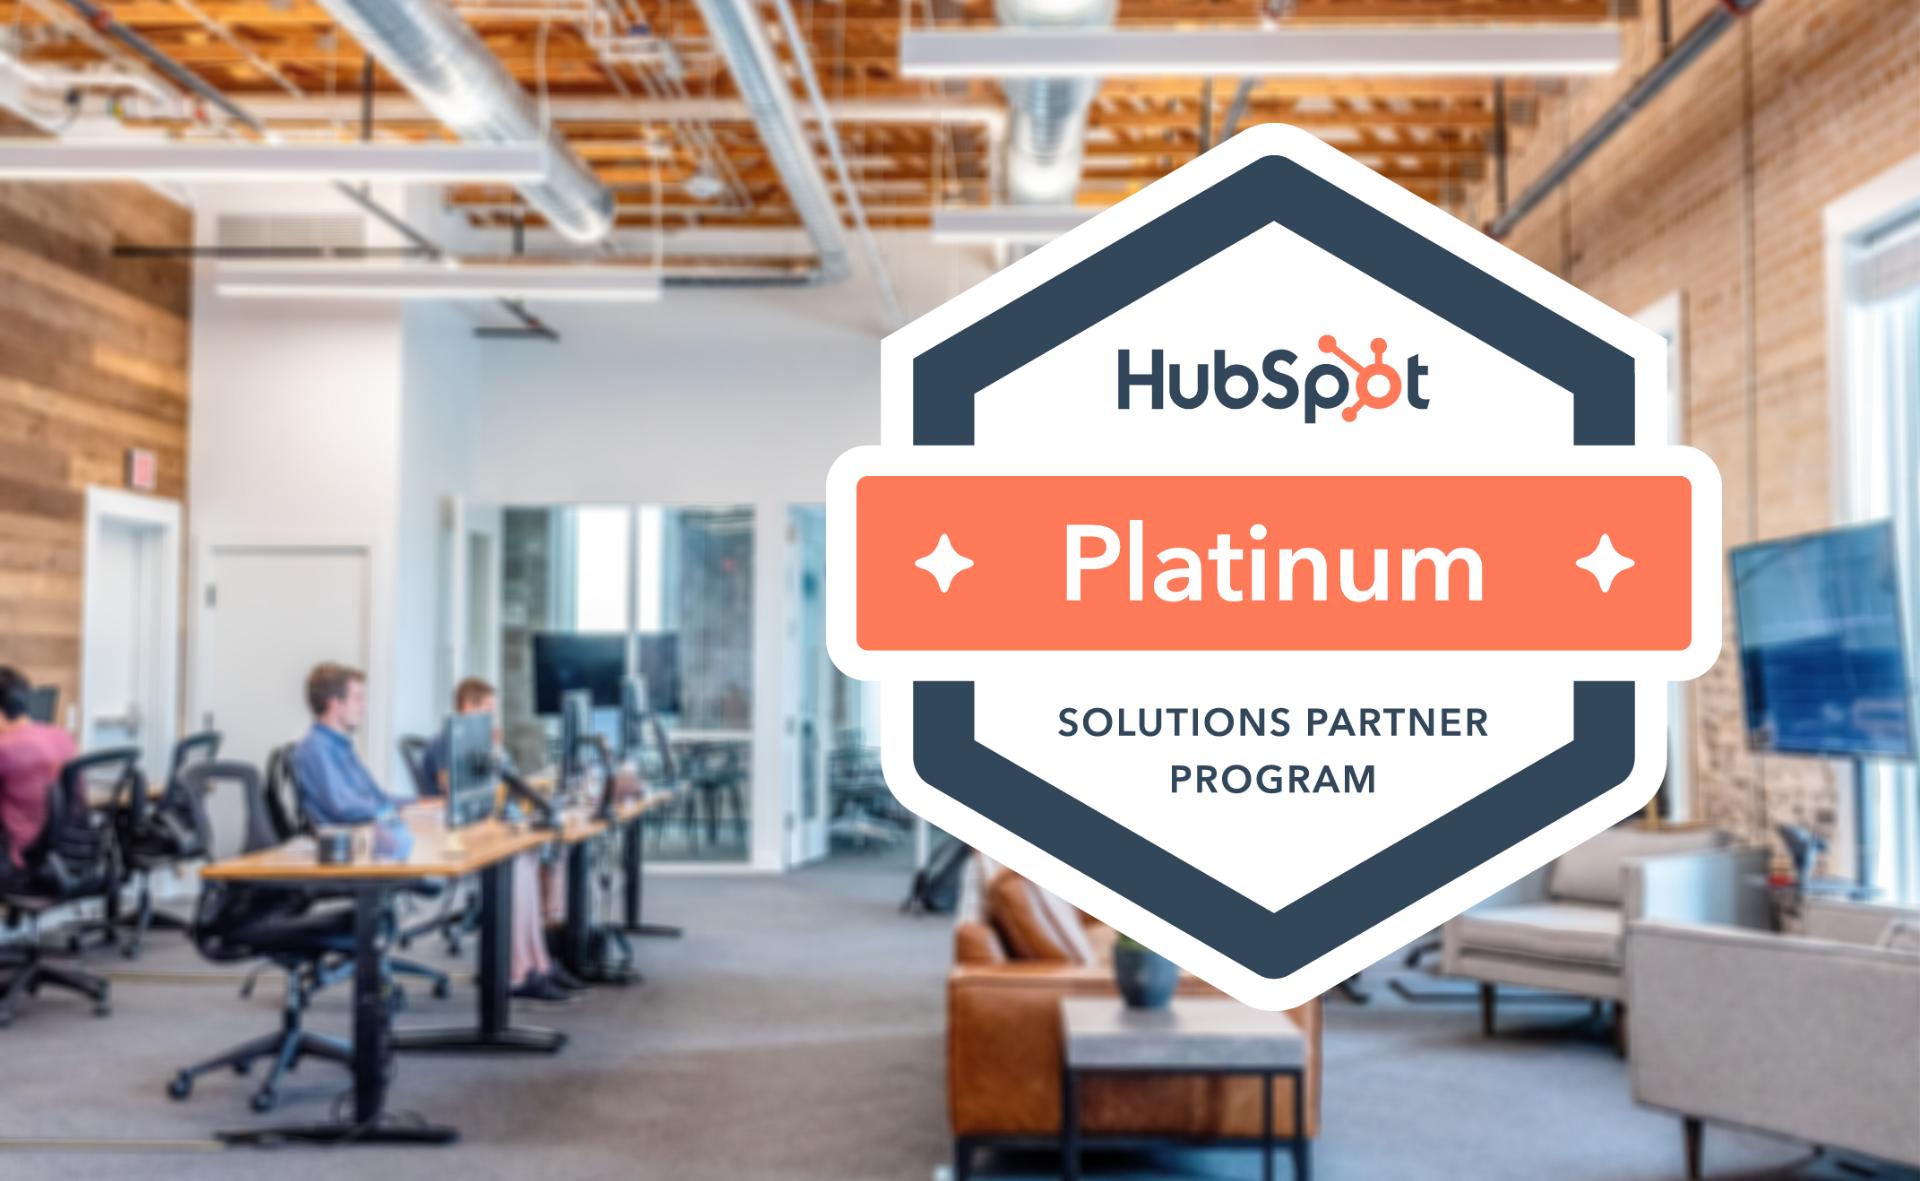 mbudo, agora Platinum Partner da HubSpot